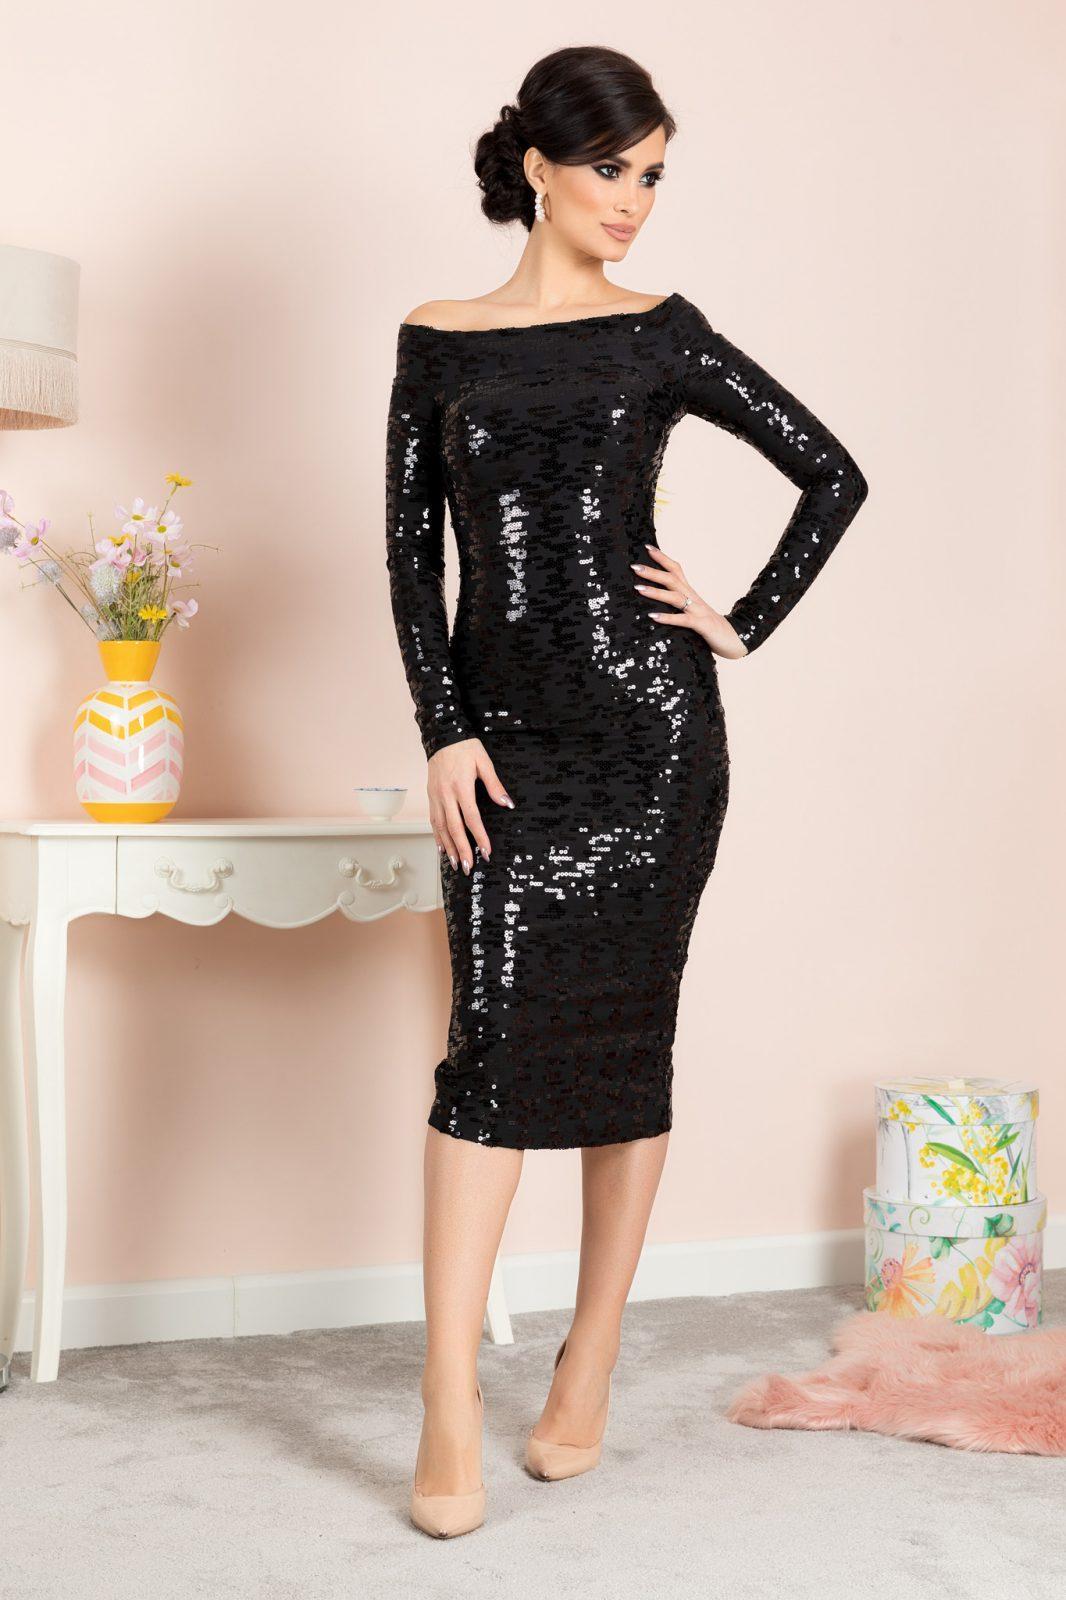 Aubrey Βραδινό Φόρεμα 7144